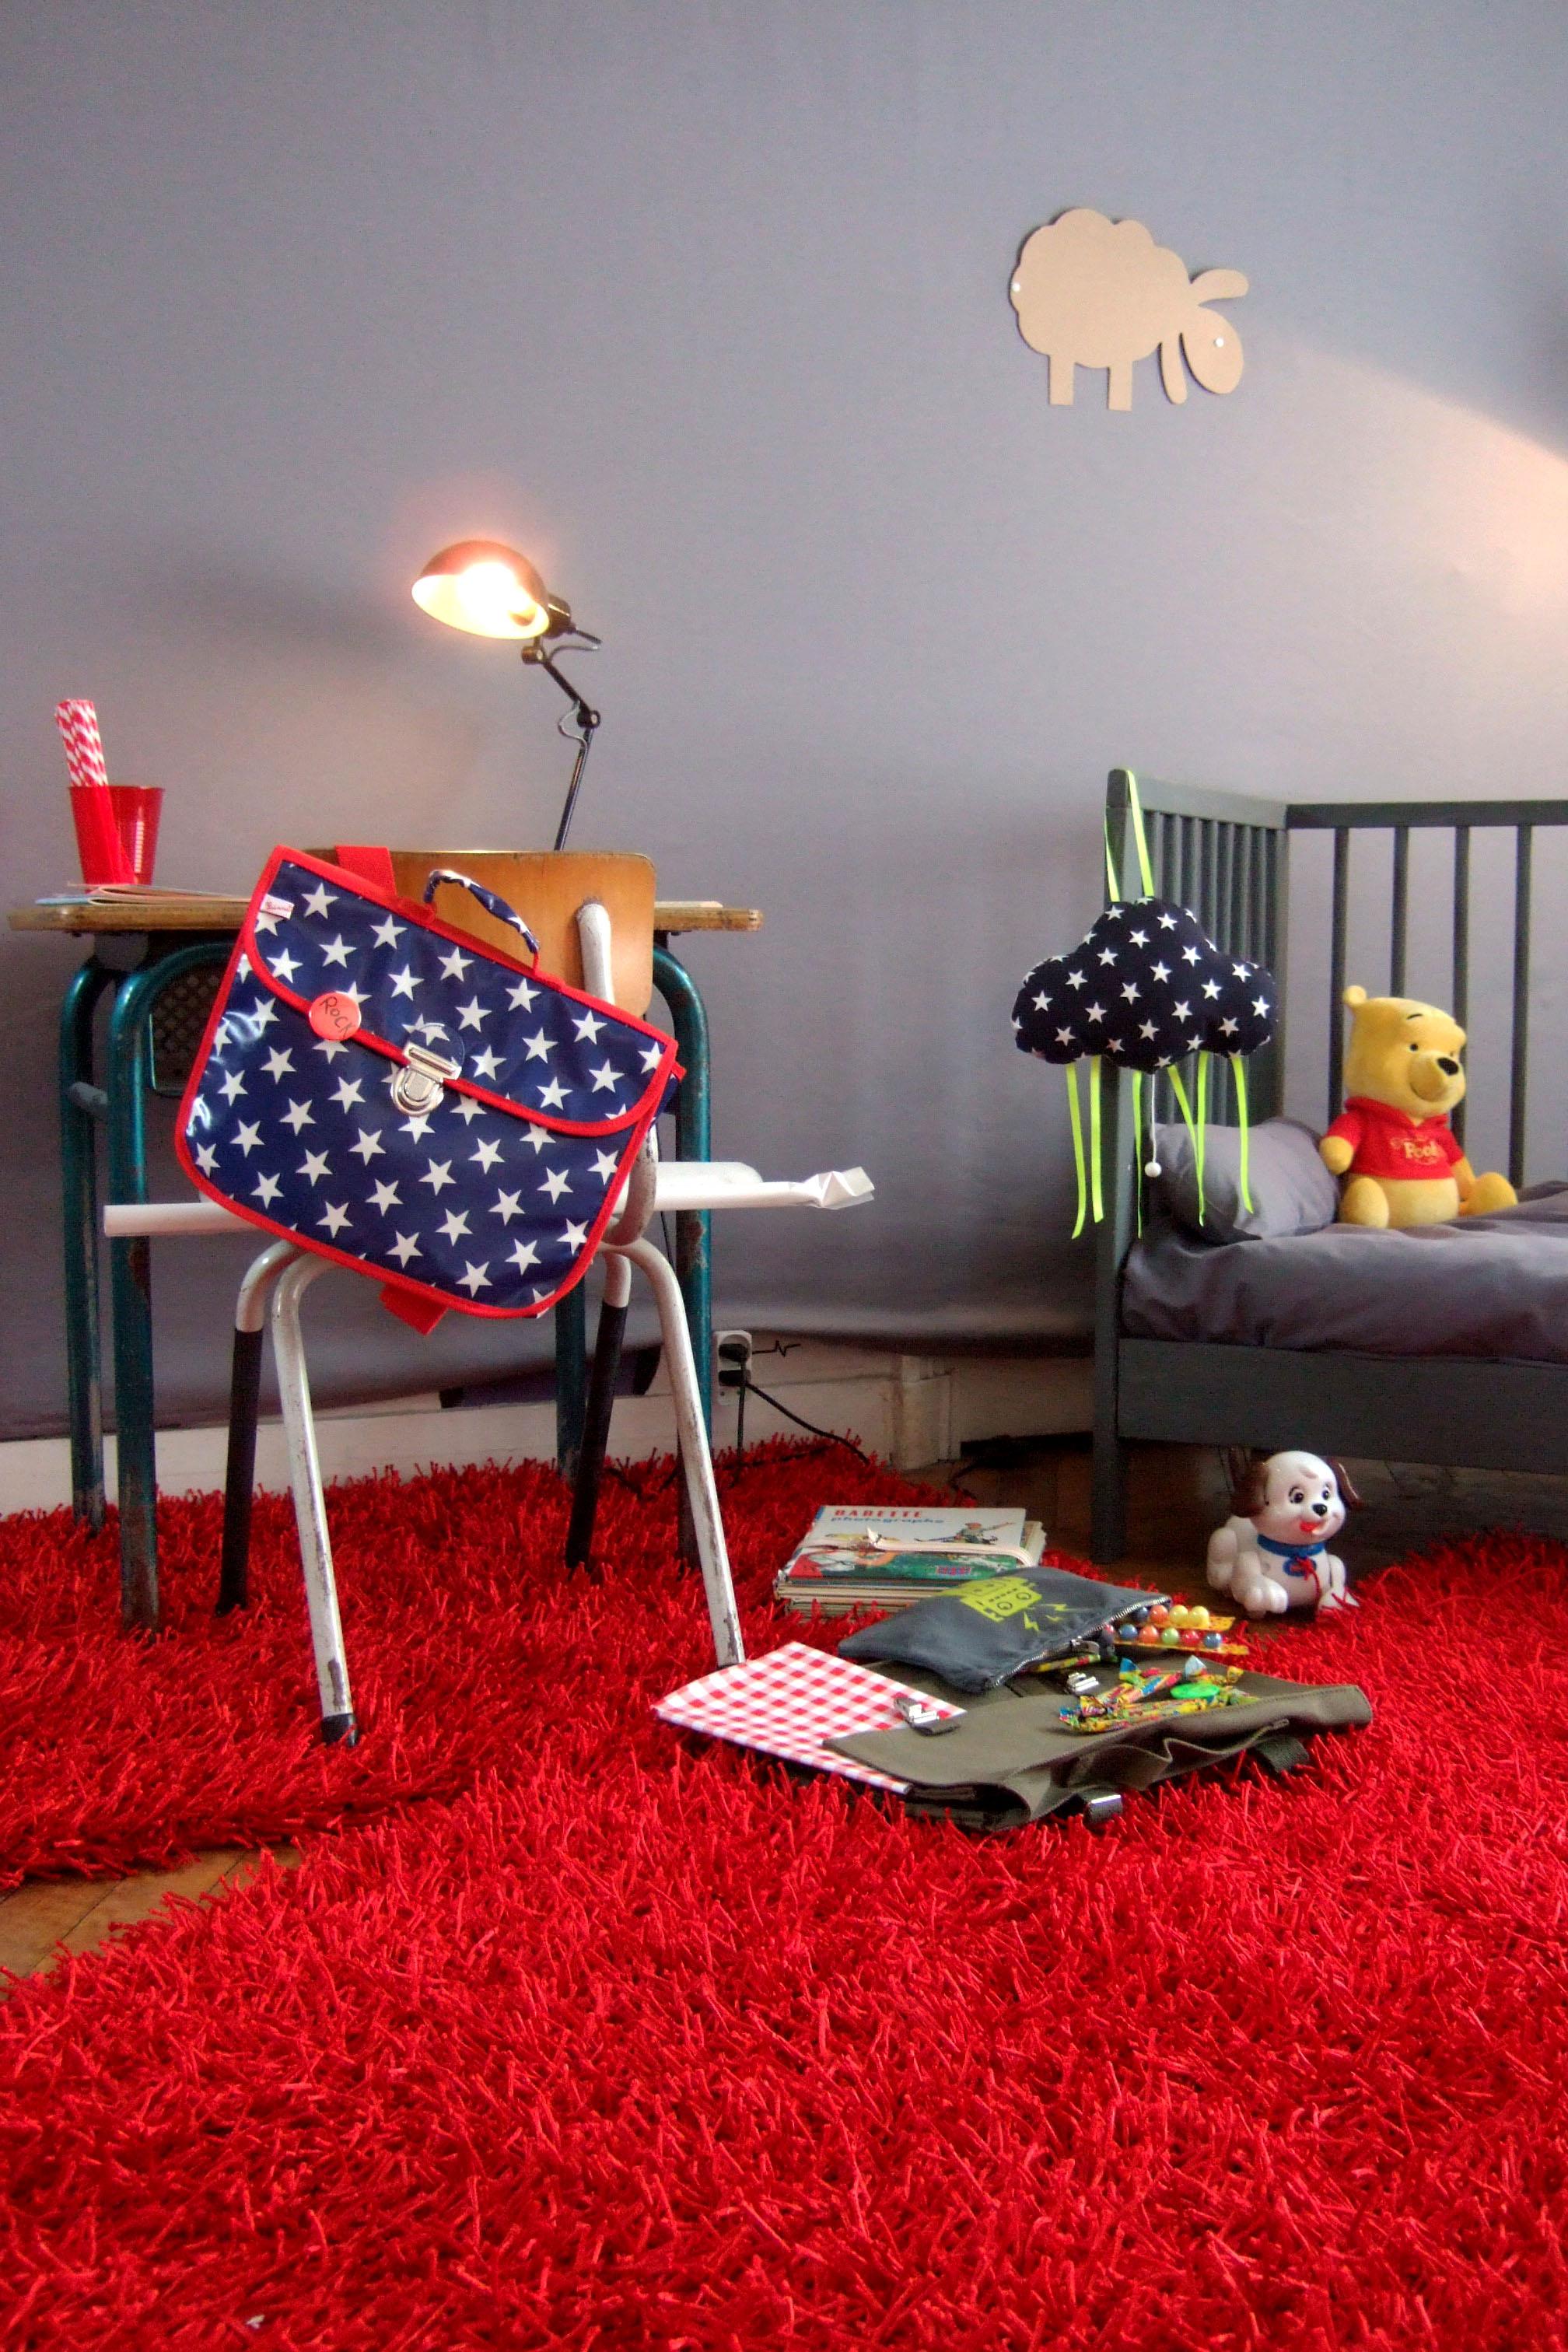 stylisme chambre d 39 enfant marion alberge d coratrice. Black Bedroom Furniture Sets. Home Design Ideas